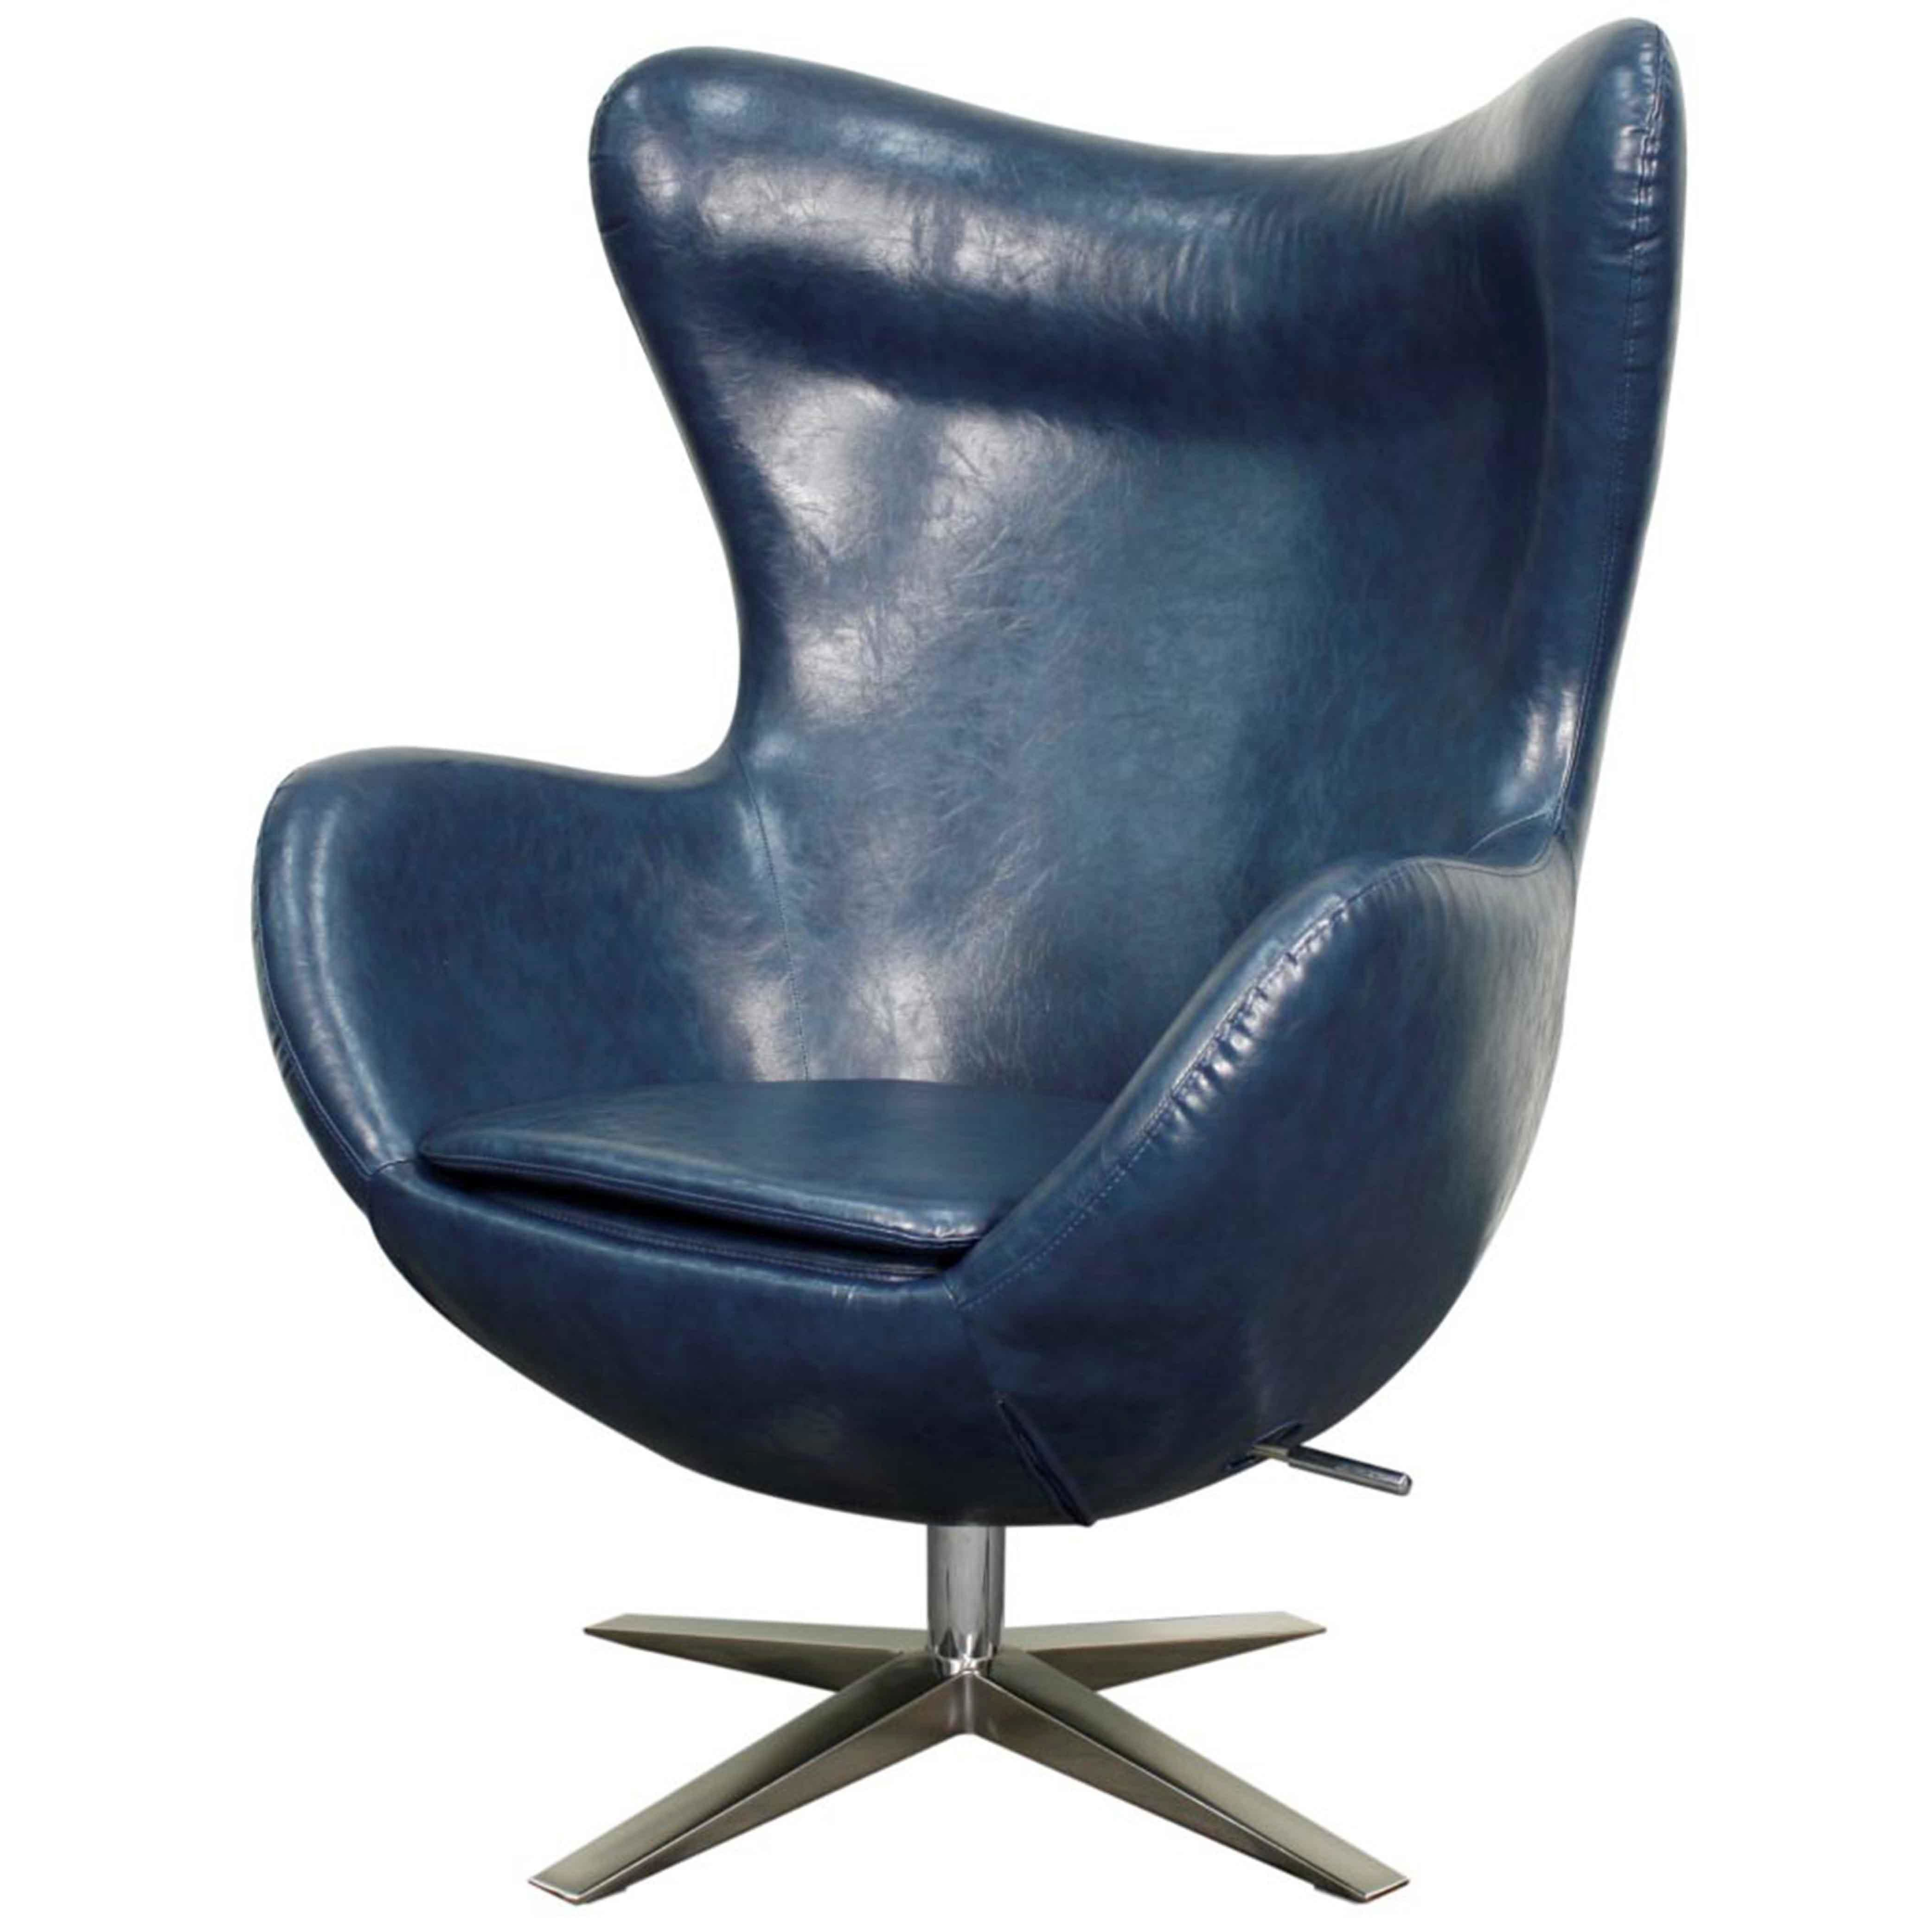 Brayden Studio Ledet Swivel Wingback Chair & Reviews | Wayfair Regarding Katrina Blue Swivel Glider Chairs (View 9 of 20)